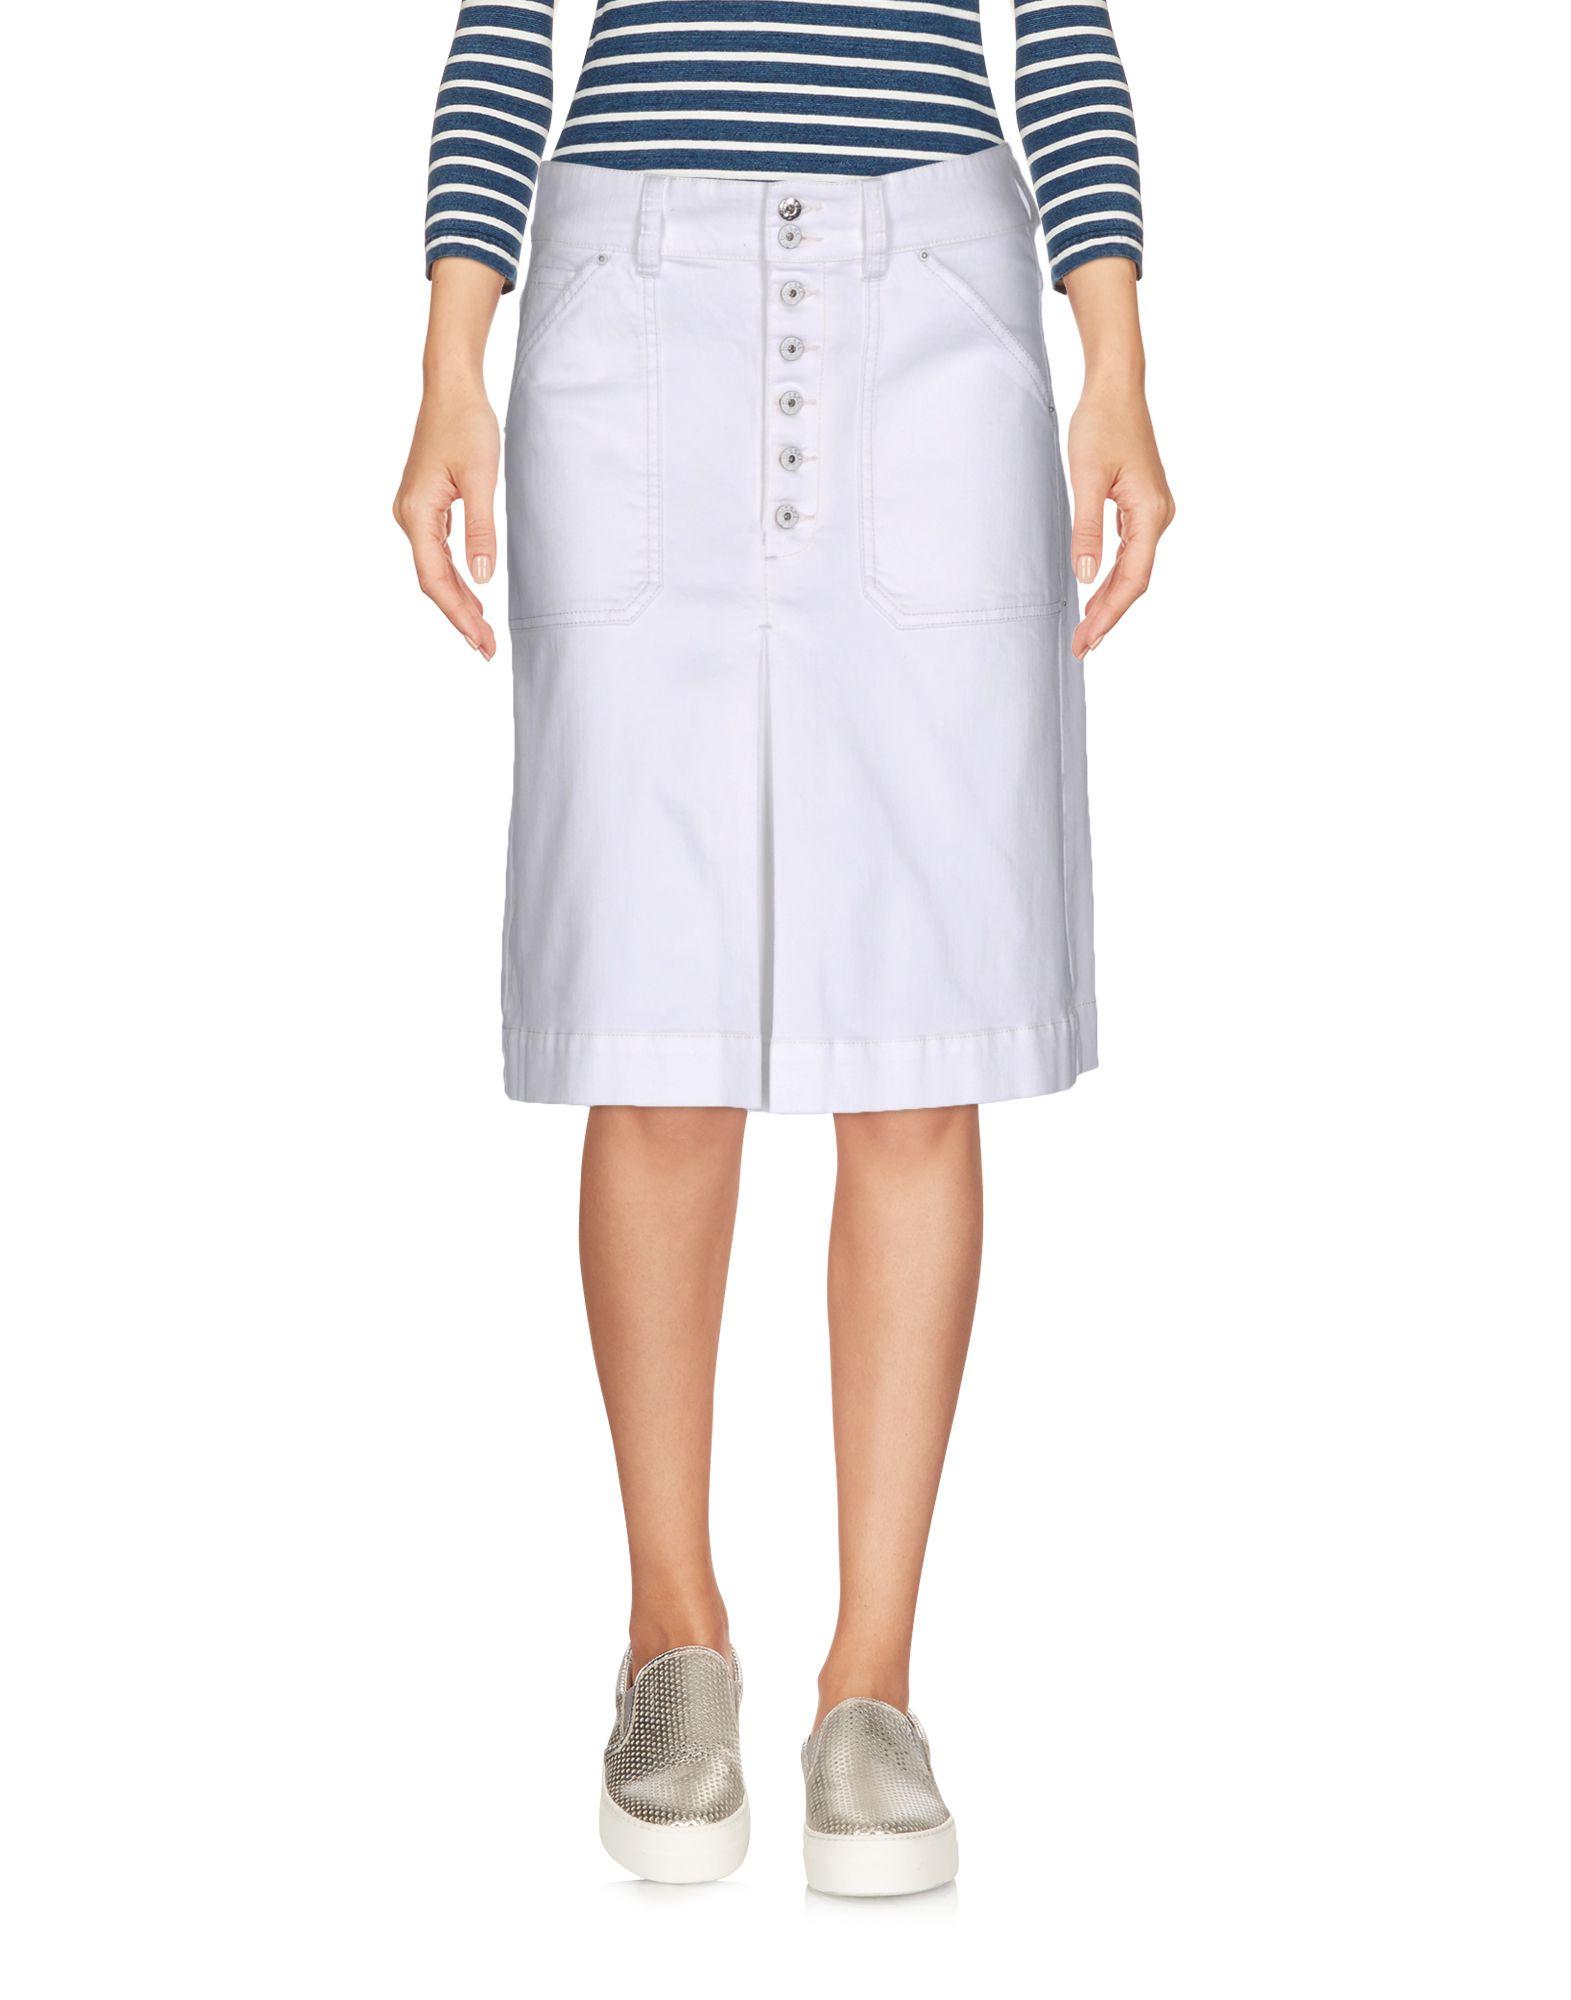 Белая юбка доставка